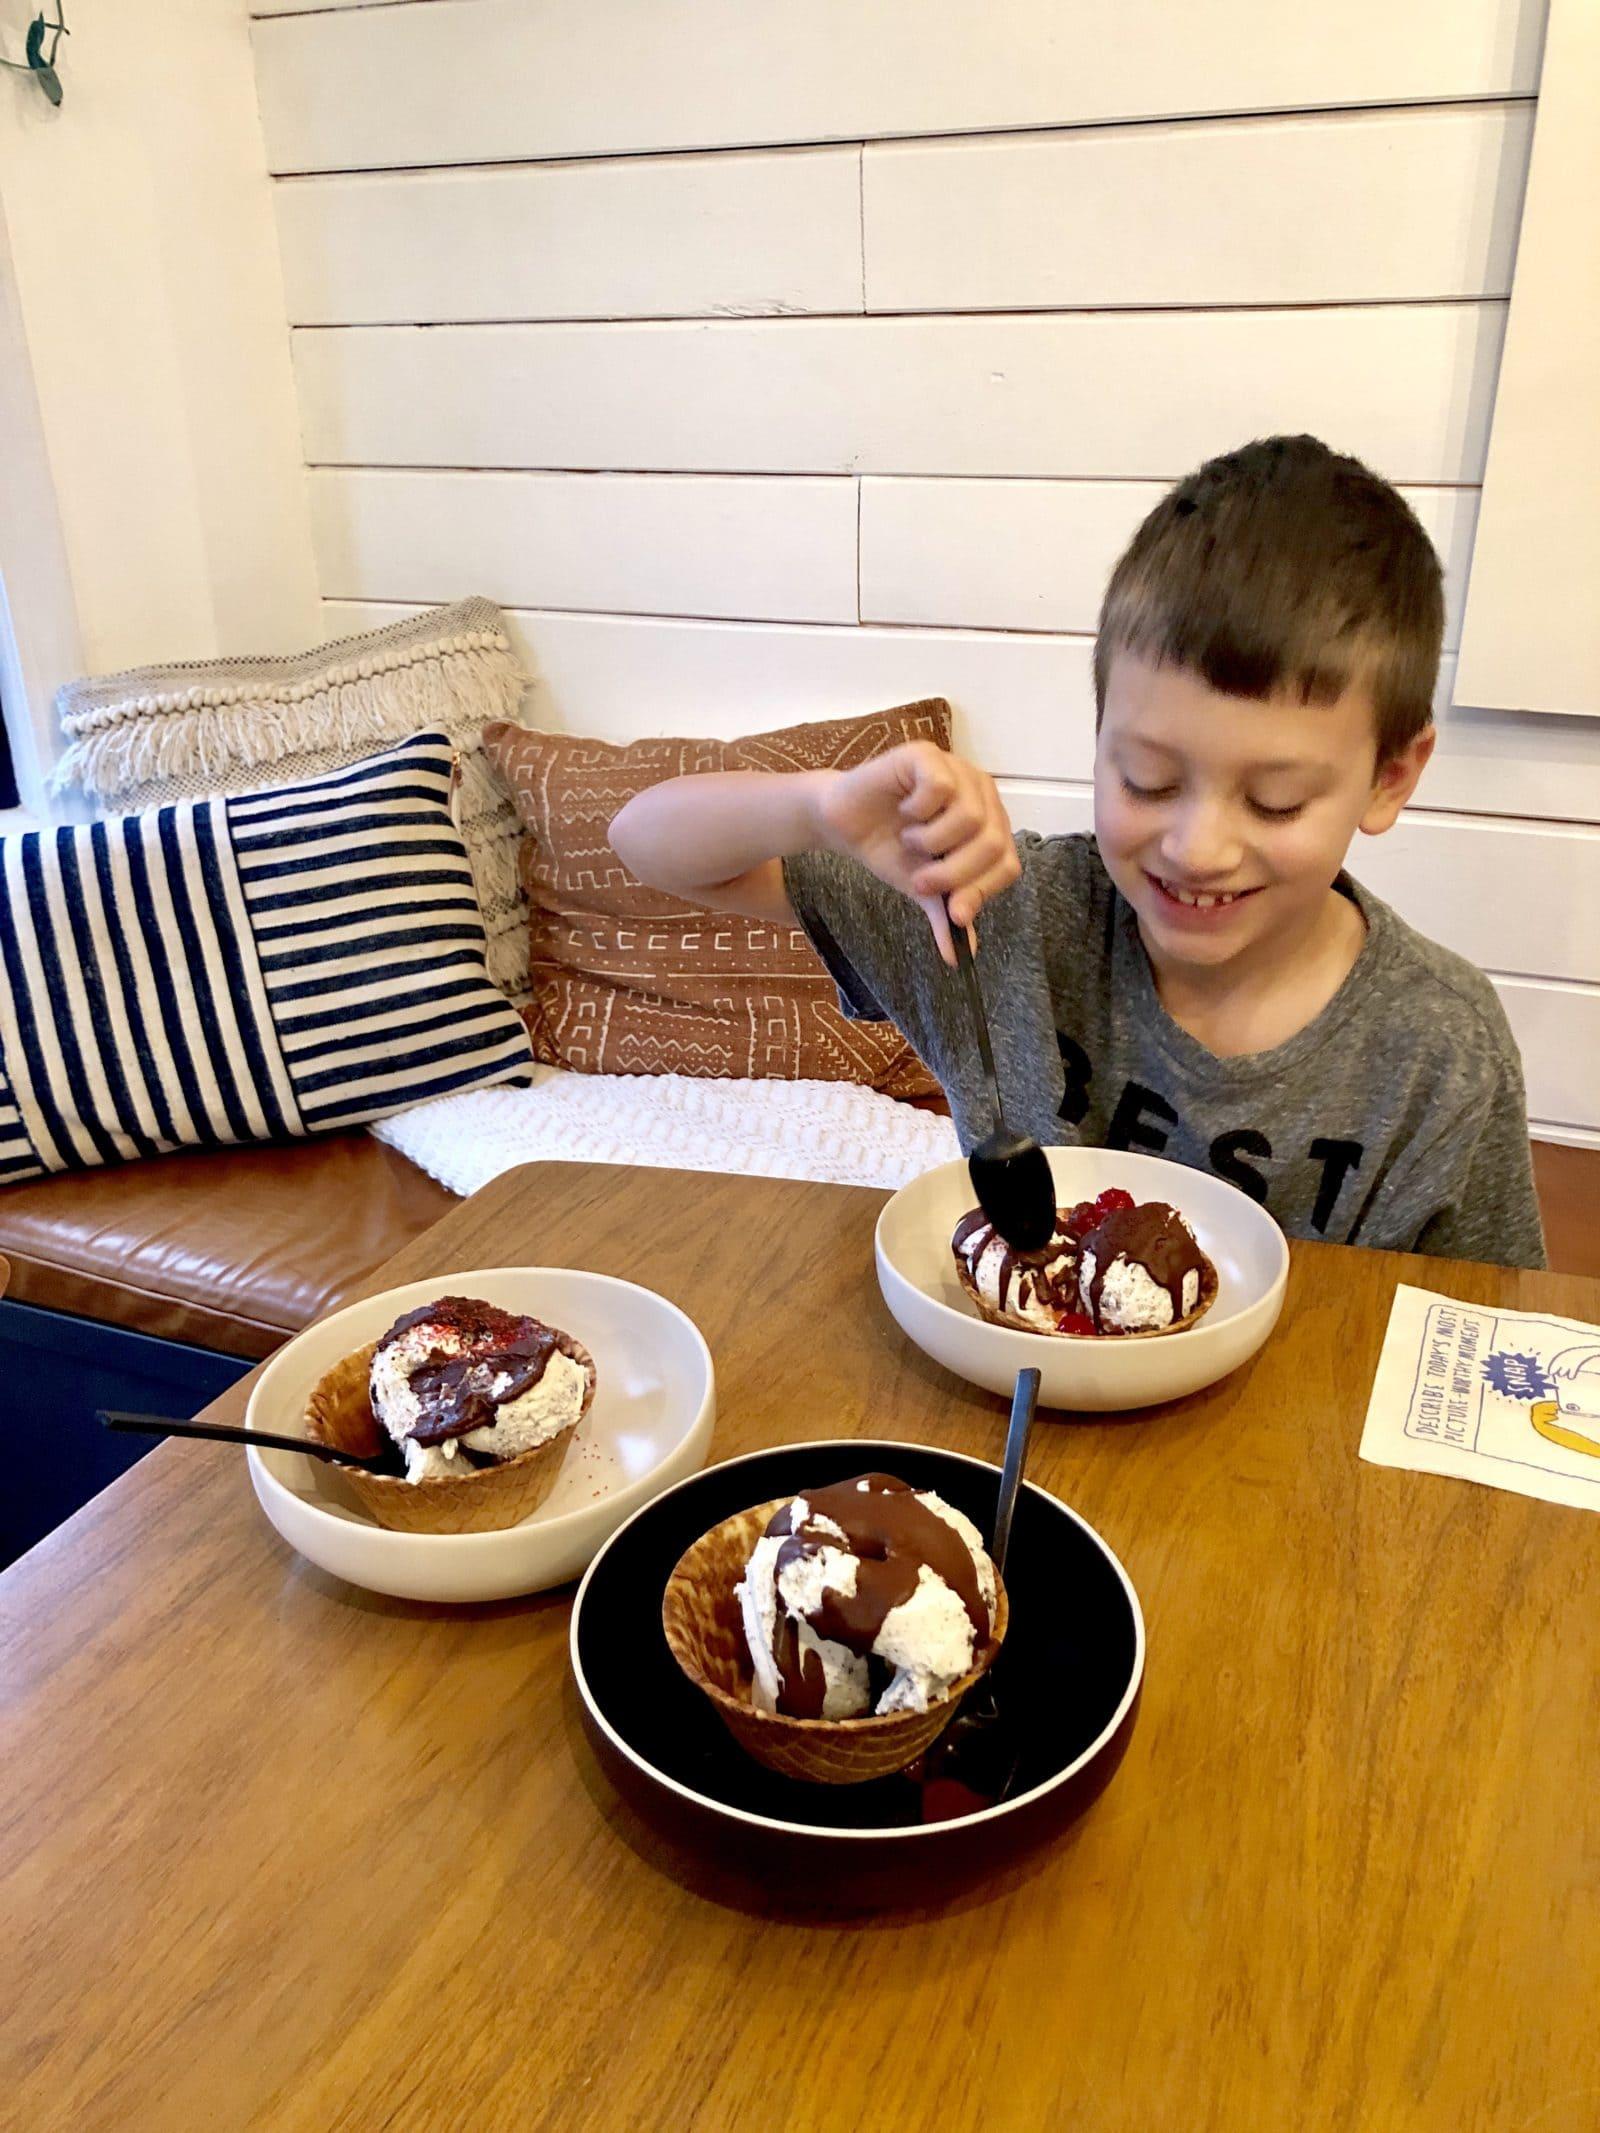 Ice cream sundae with kid smiling